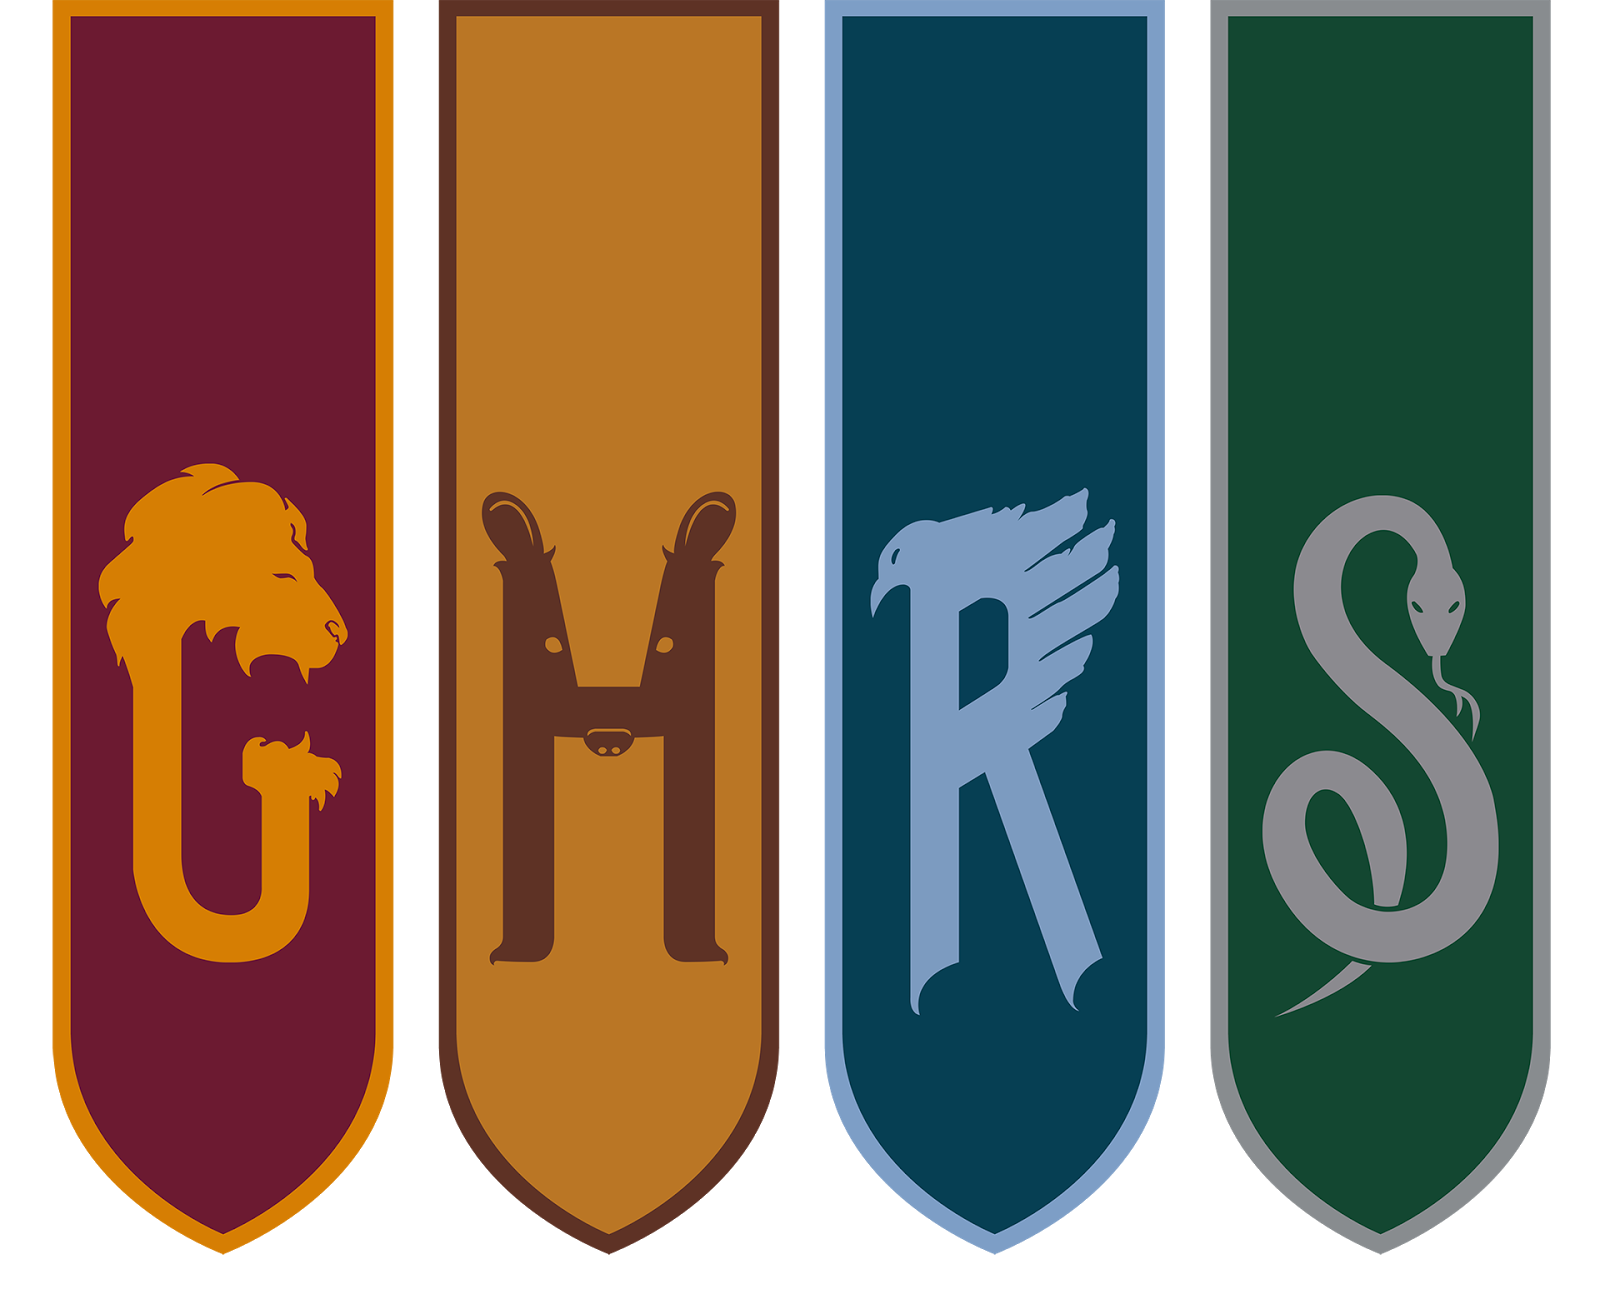 Casas de hogwarts harry potter im genes escudos y m s - Test de harry potter casas ...